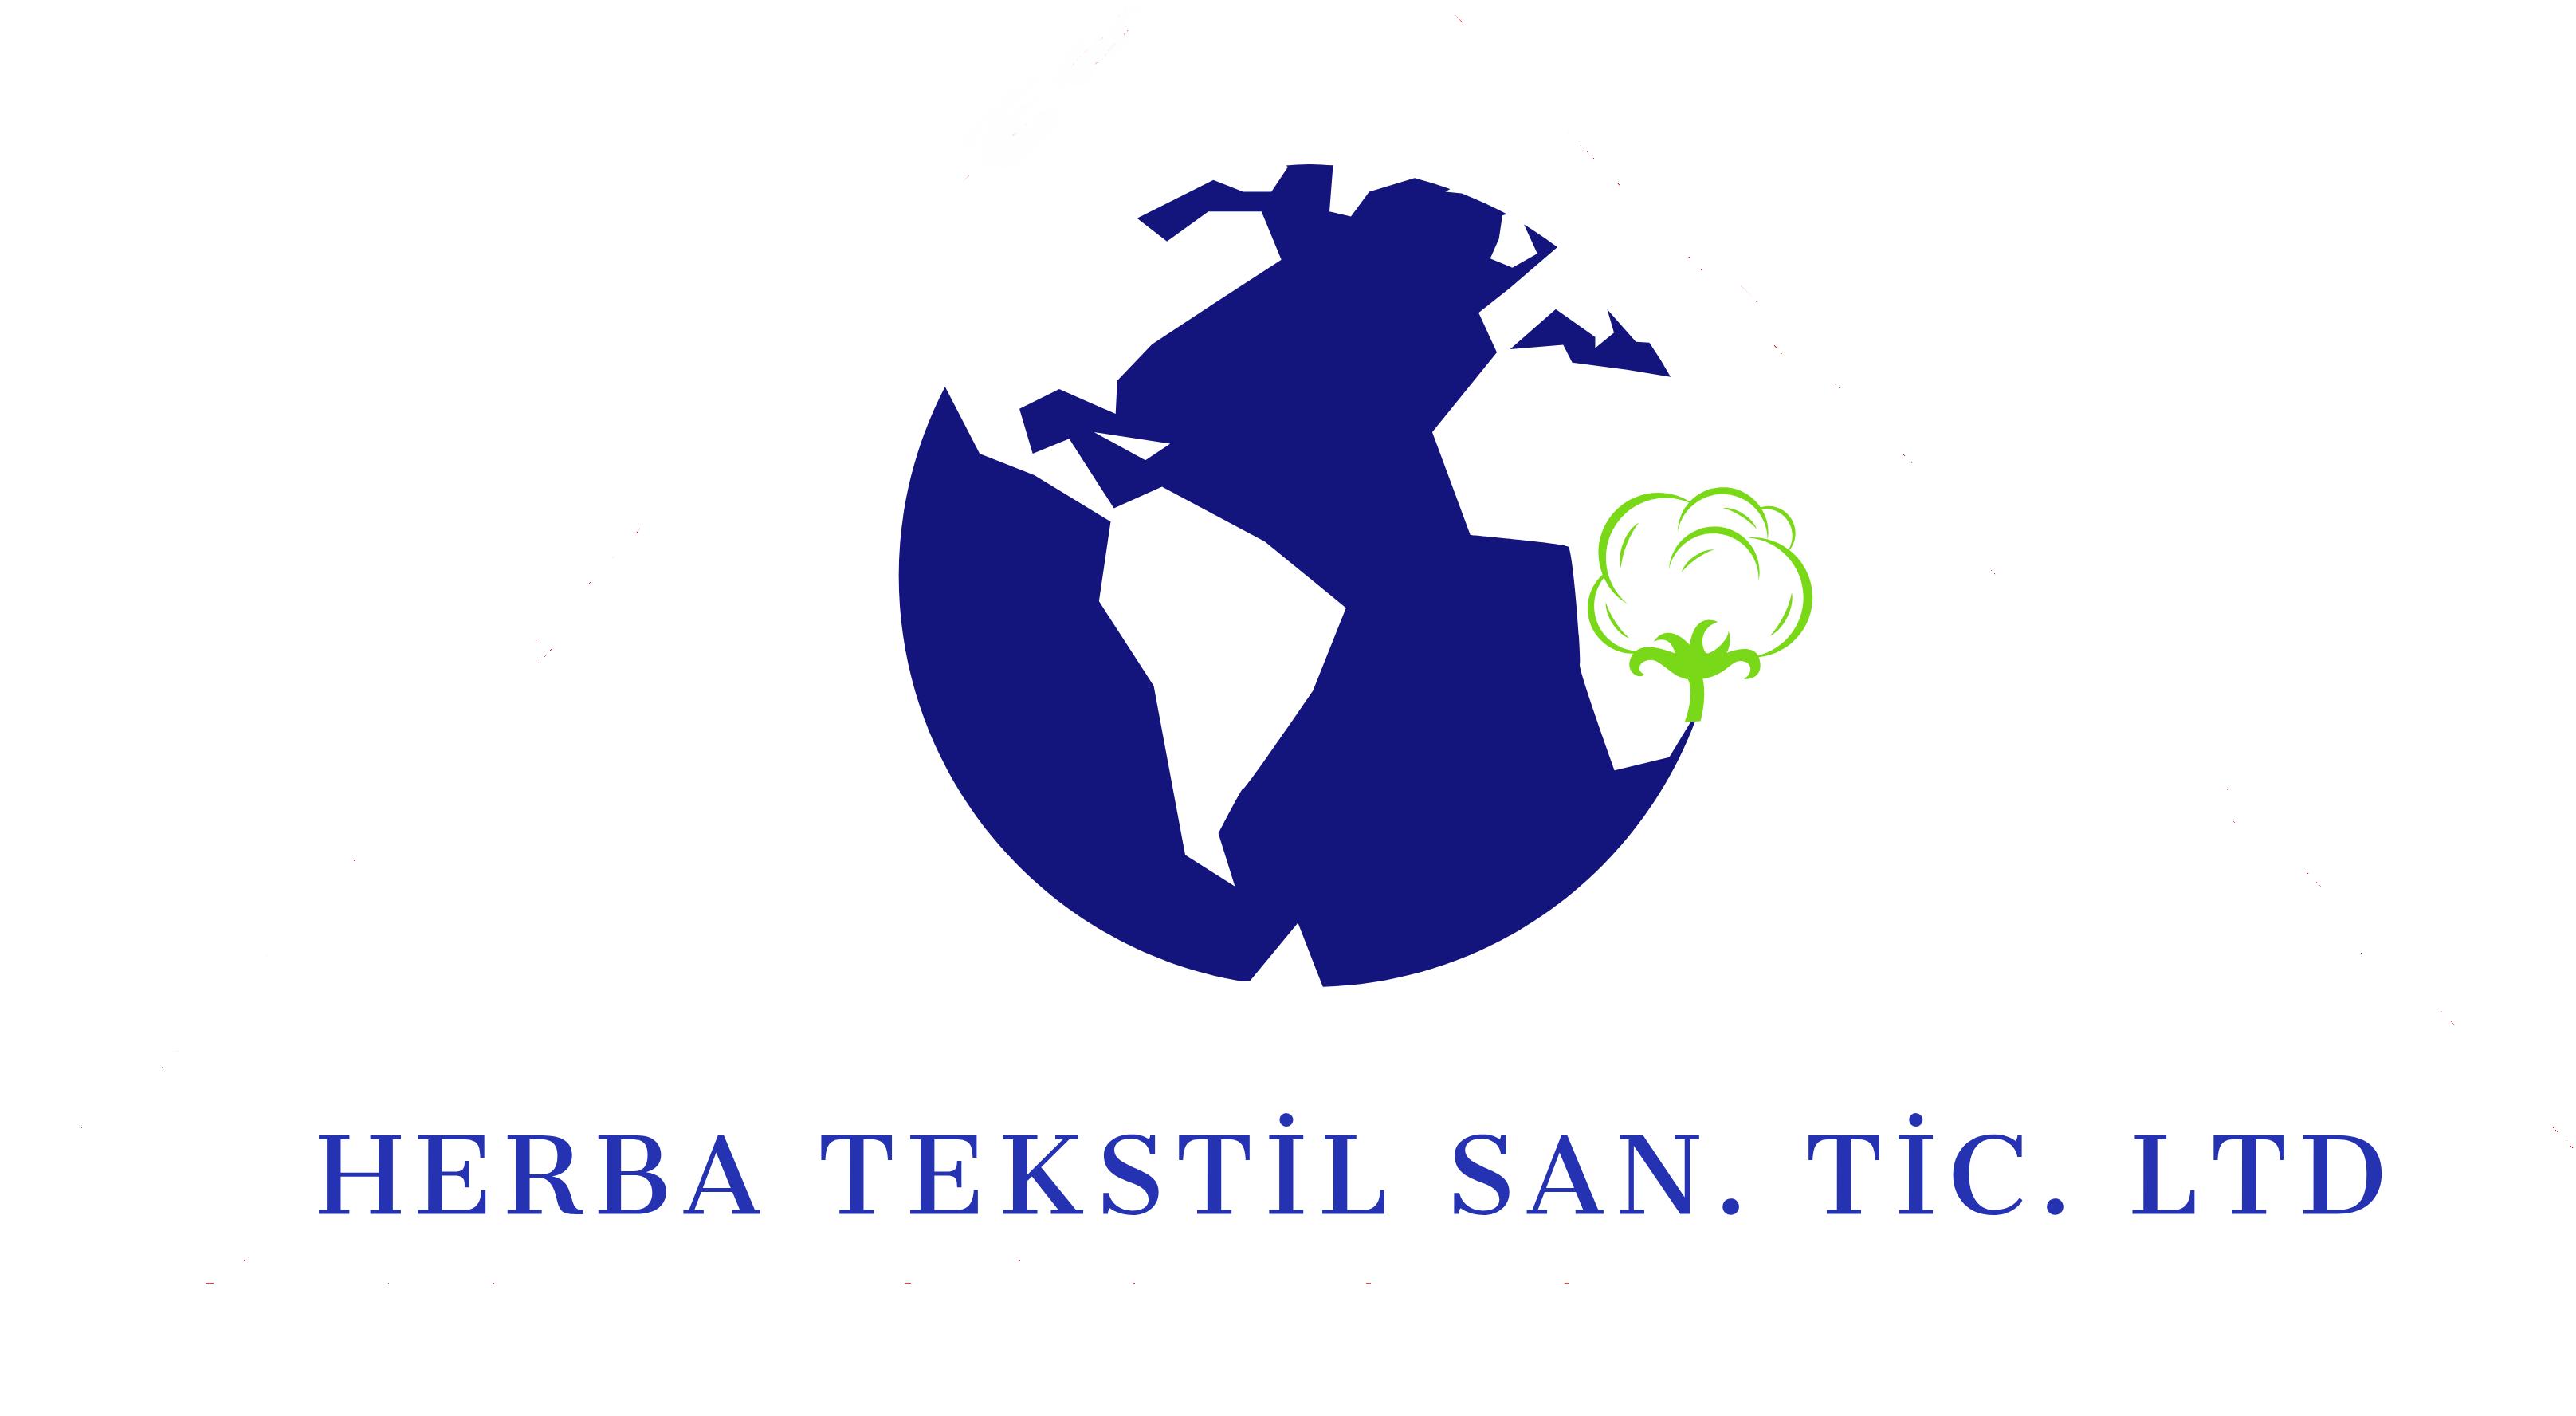 HERBA TEKSTİL SAN. TIC. LTD